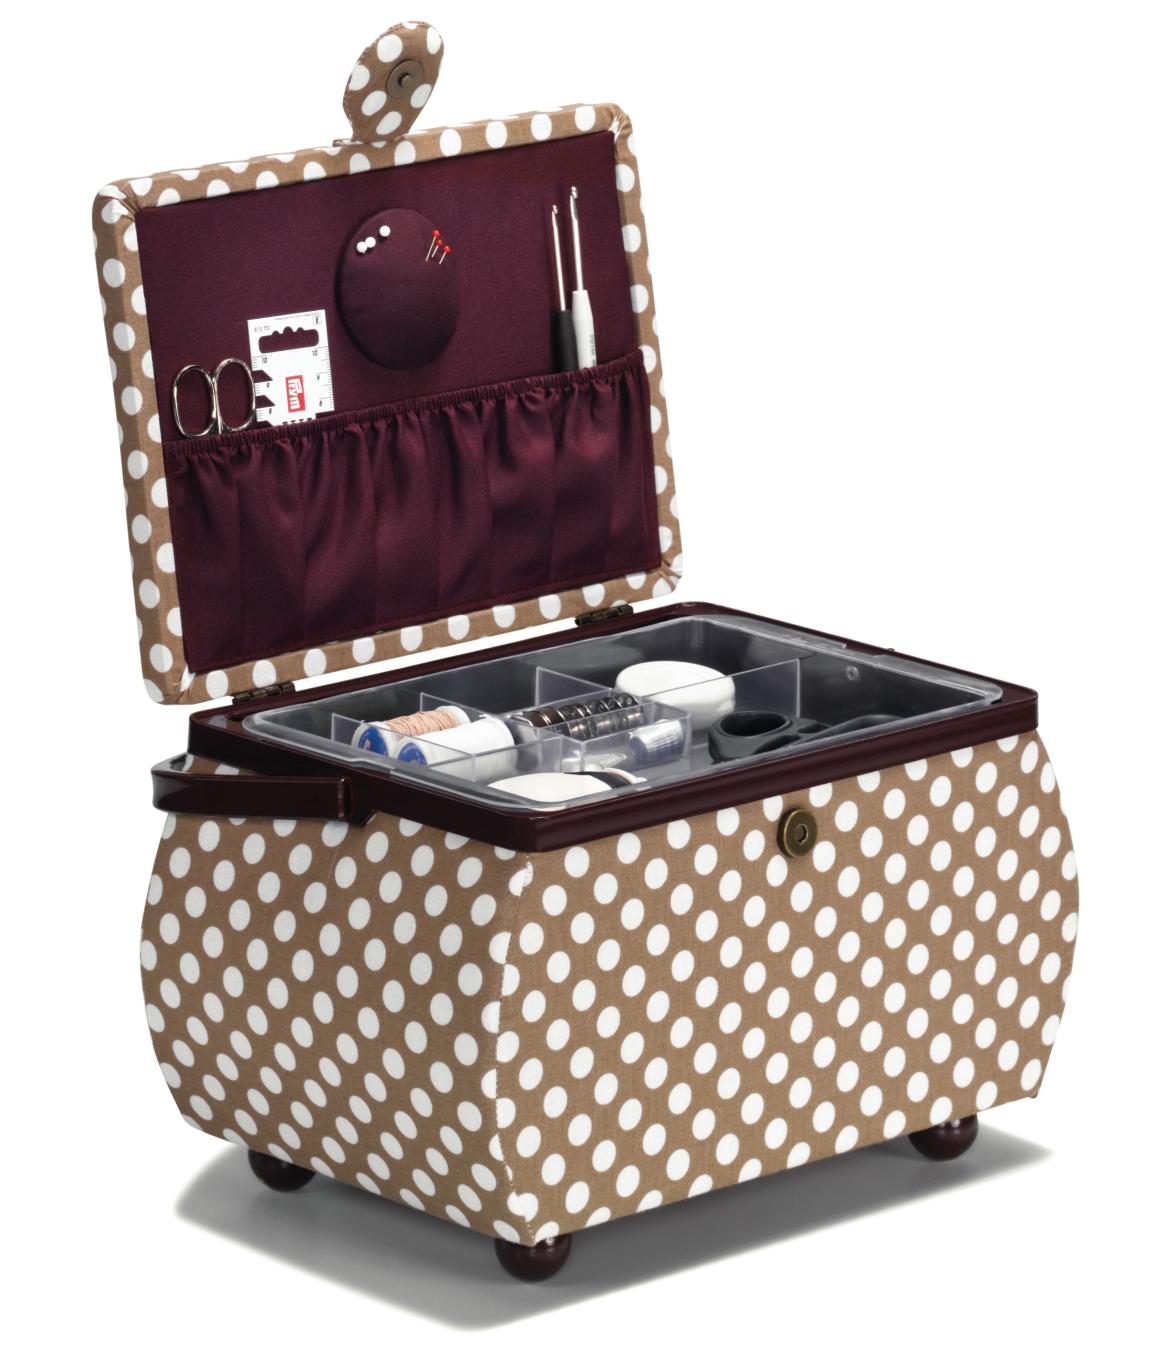 Sewing basket Polka Dots beige/burgundy L | Nähkorb Polka Dots beige/burgund L